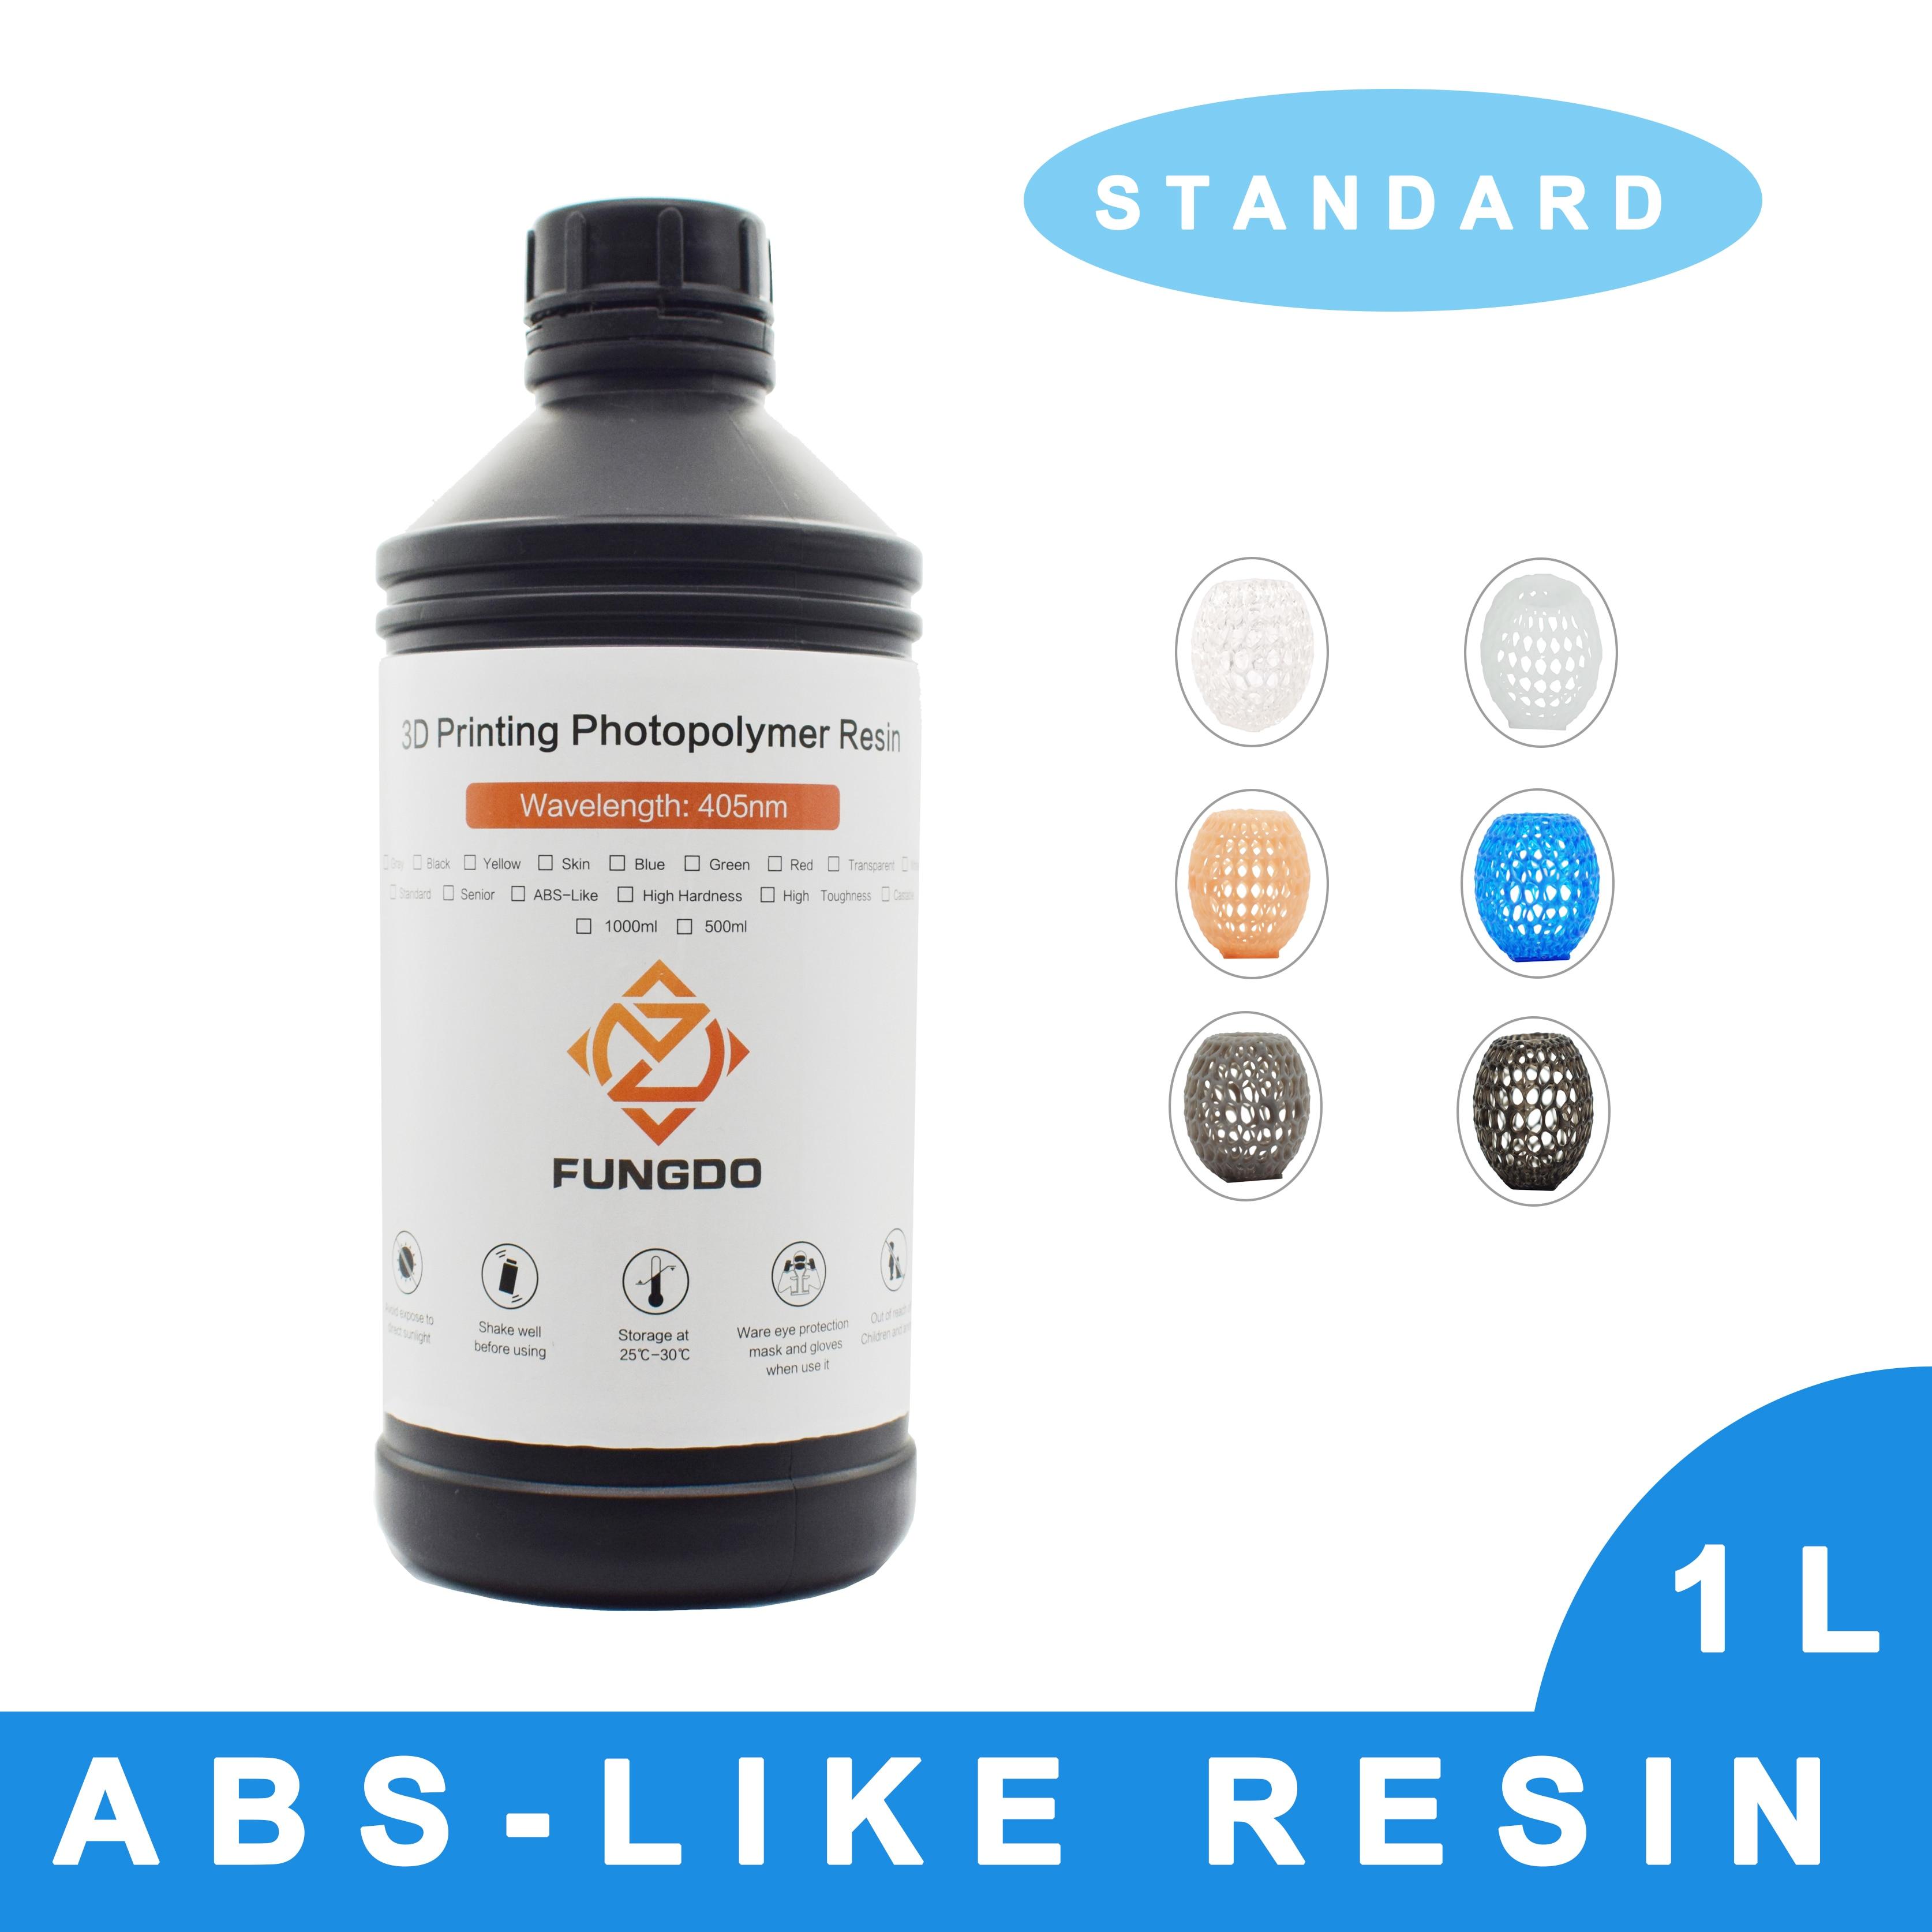 FUNGDO 3d printer resin standard ABS-like photopolymer 3D print liquid 405nm UV light sensitive for